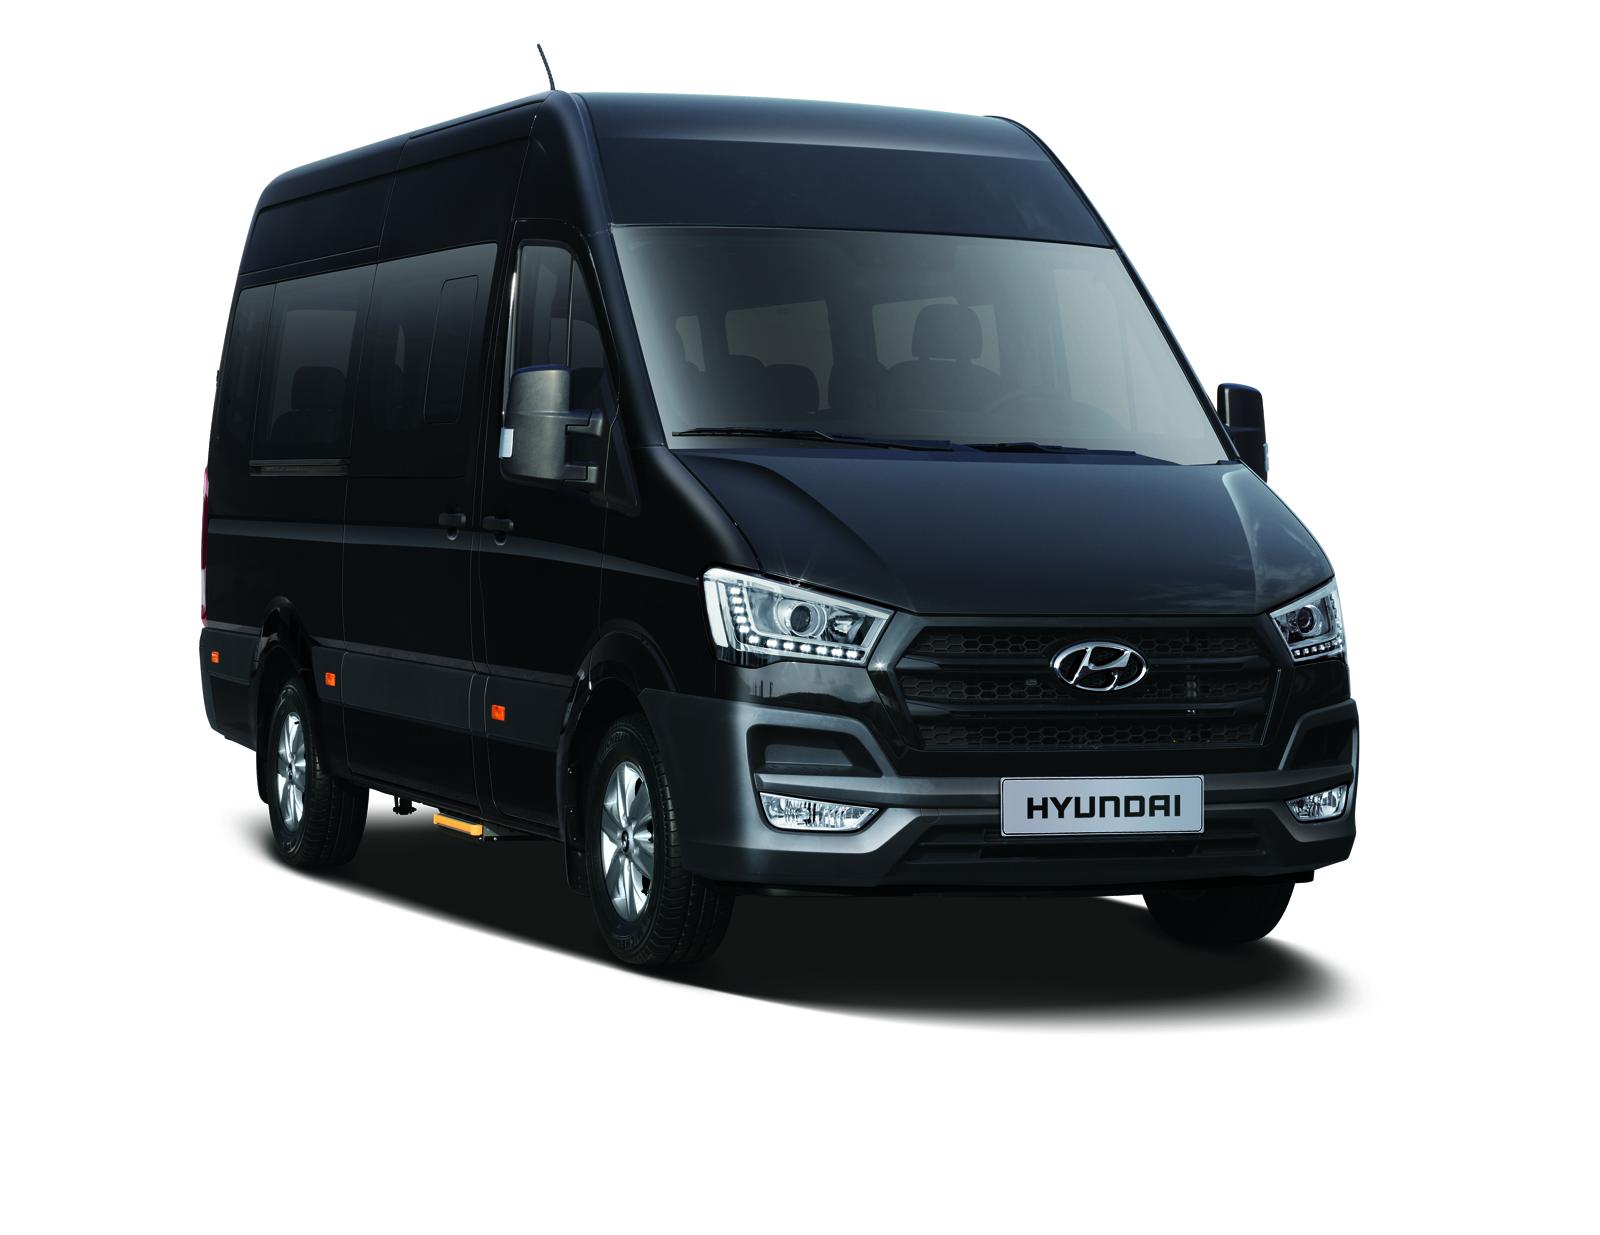 Hyundai yeni hafif ticarisi h350 39 yi tan tt otoyazar for Garage hyundai paris 18